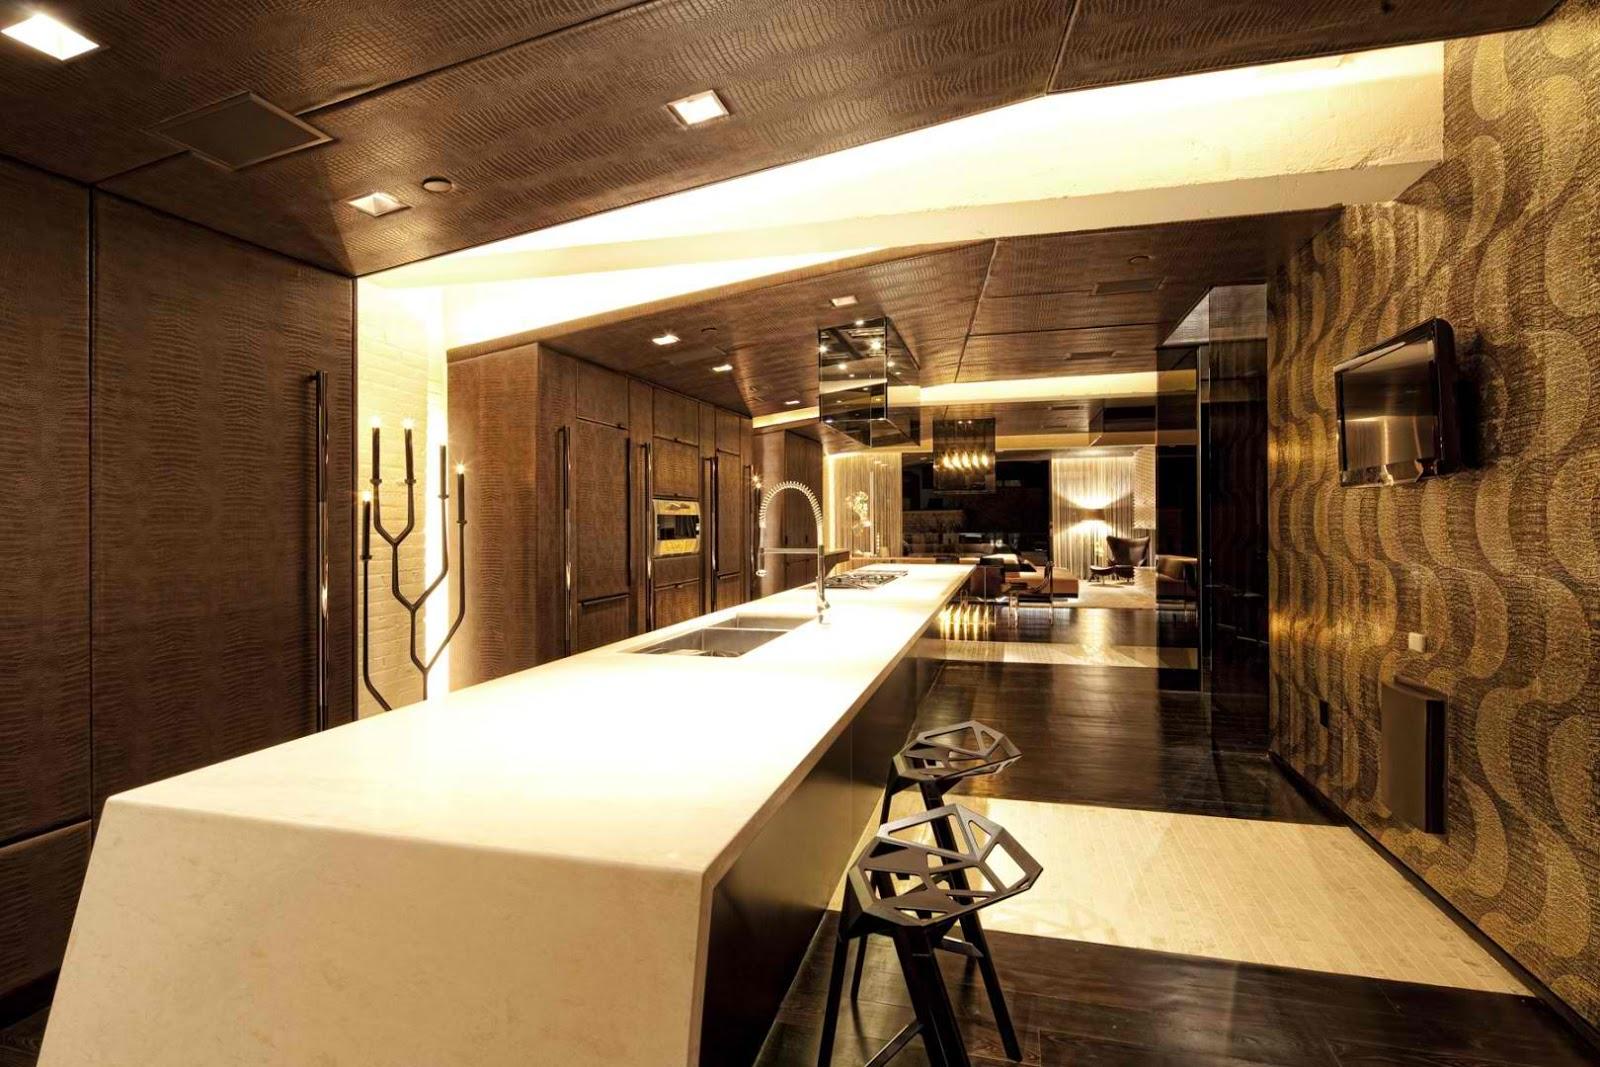 http://1.bp.blogspot.com/-OhLIIKnnggA/UKNVCFBQIDI/AAAAAAAAInw/000ECUAAYao/s1600/luxury_modern_5_interior_design_skylab_architecture.jpg